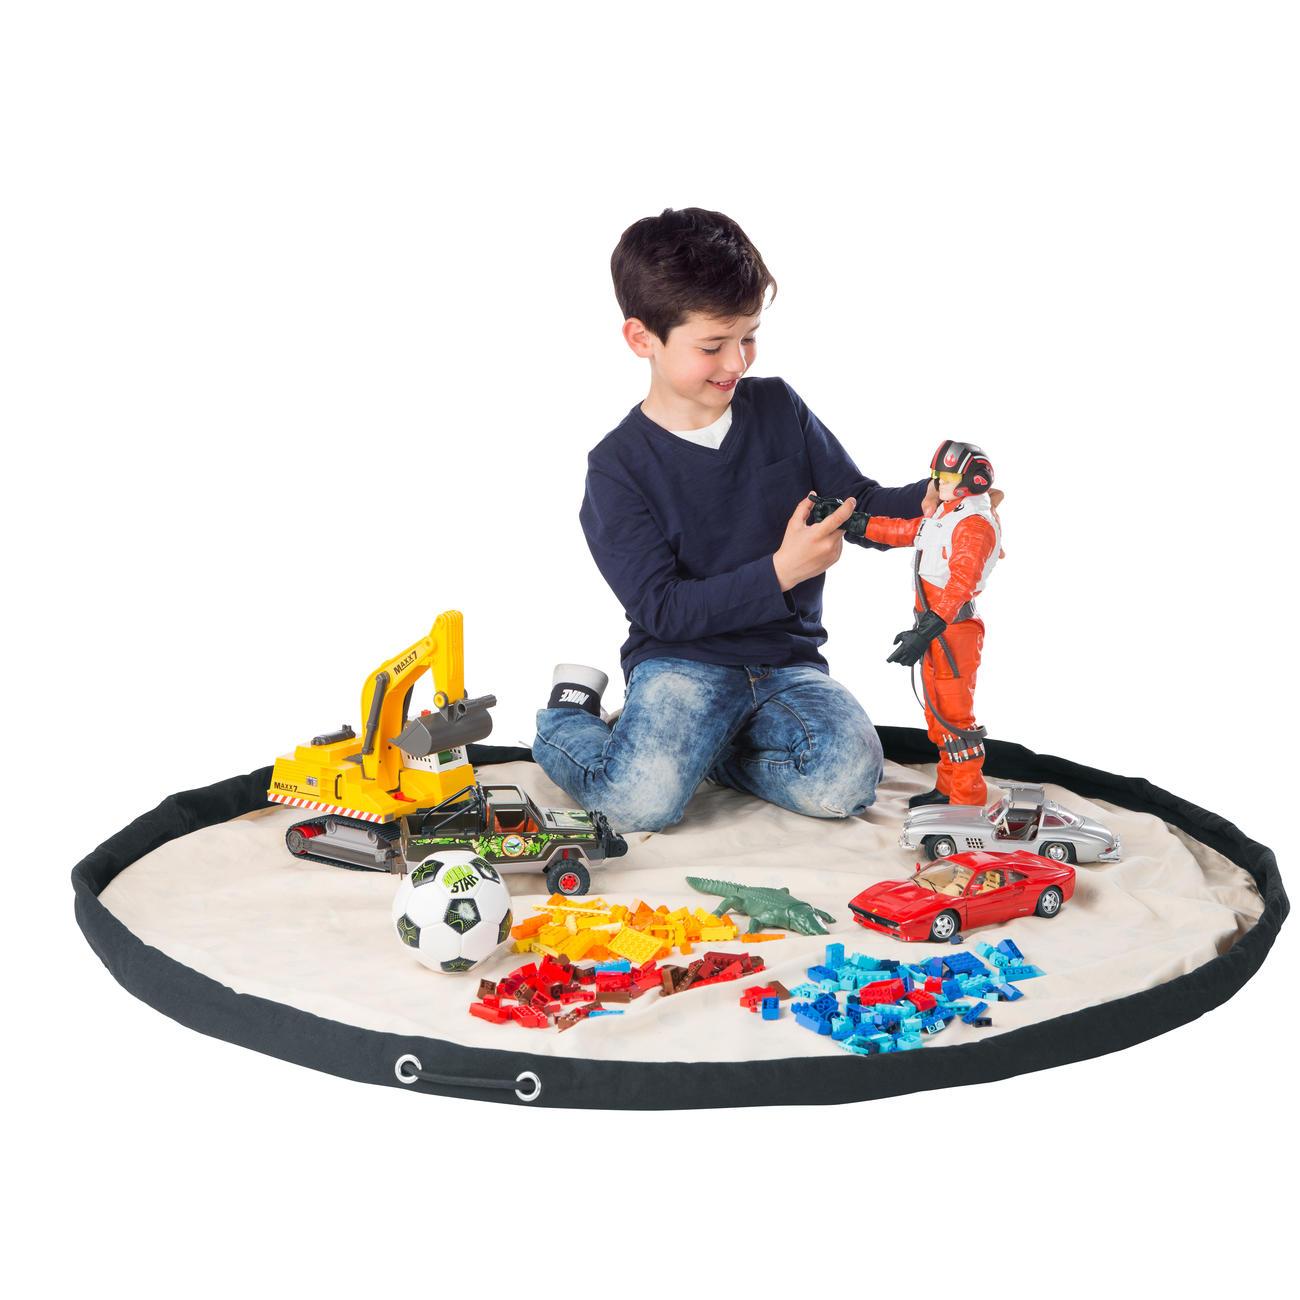 spielzeugbeutel play go panda 140 cm durchmesser. Black Bedroom Furniture Sets. Home Design Ideas